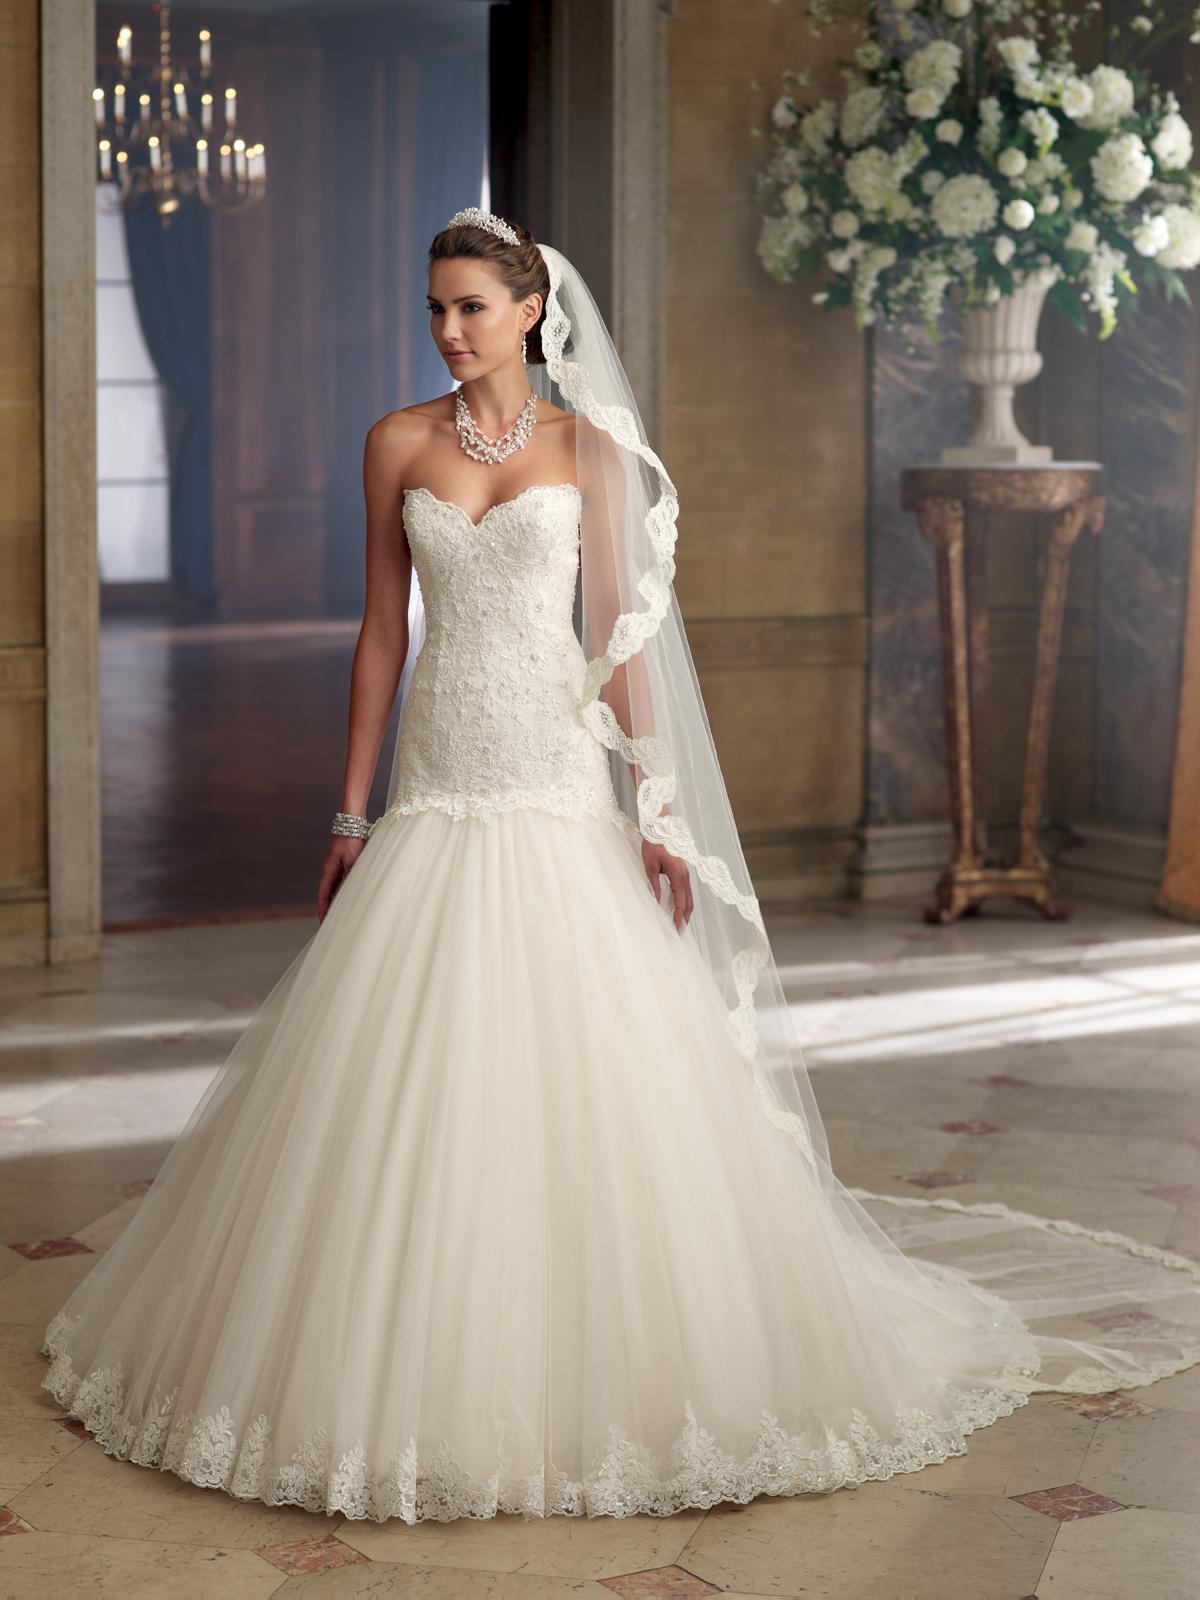 choose wedding dresses for short women | celebrate wedding